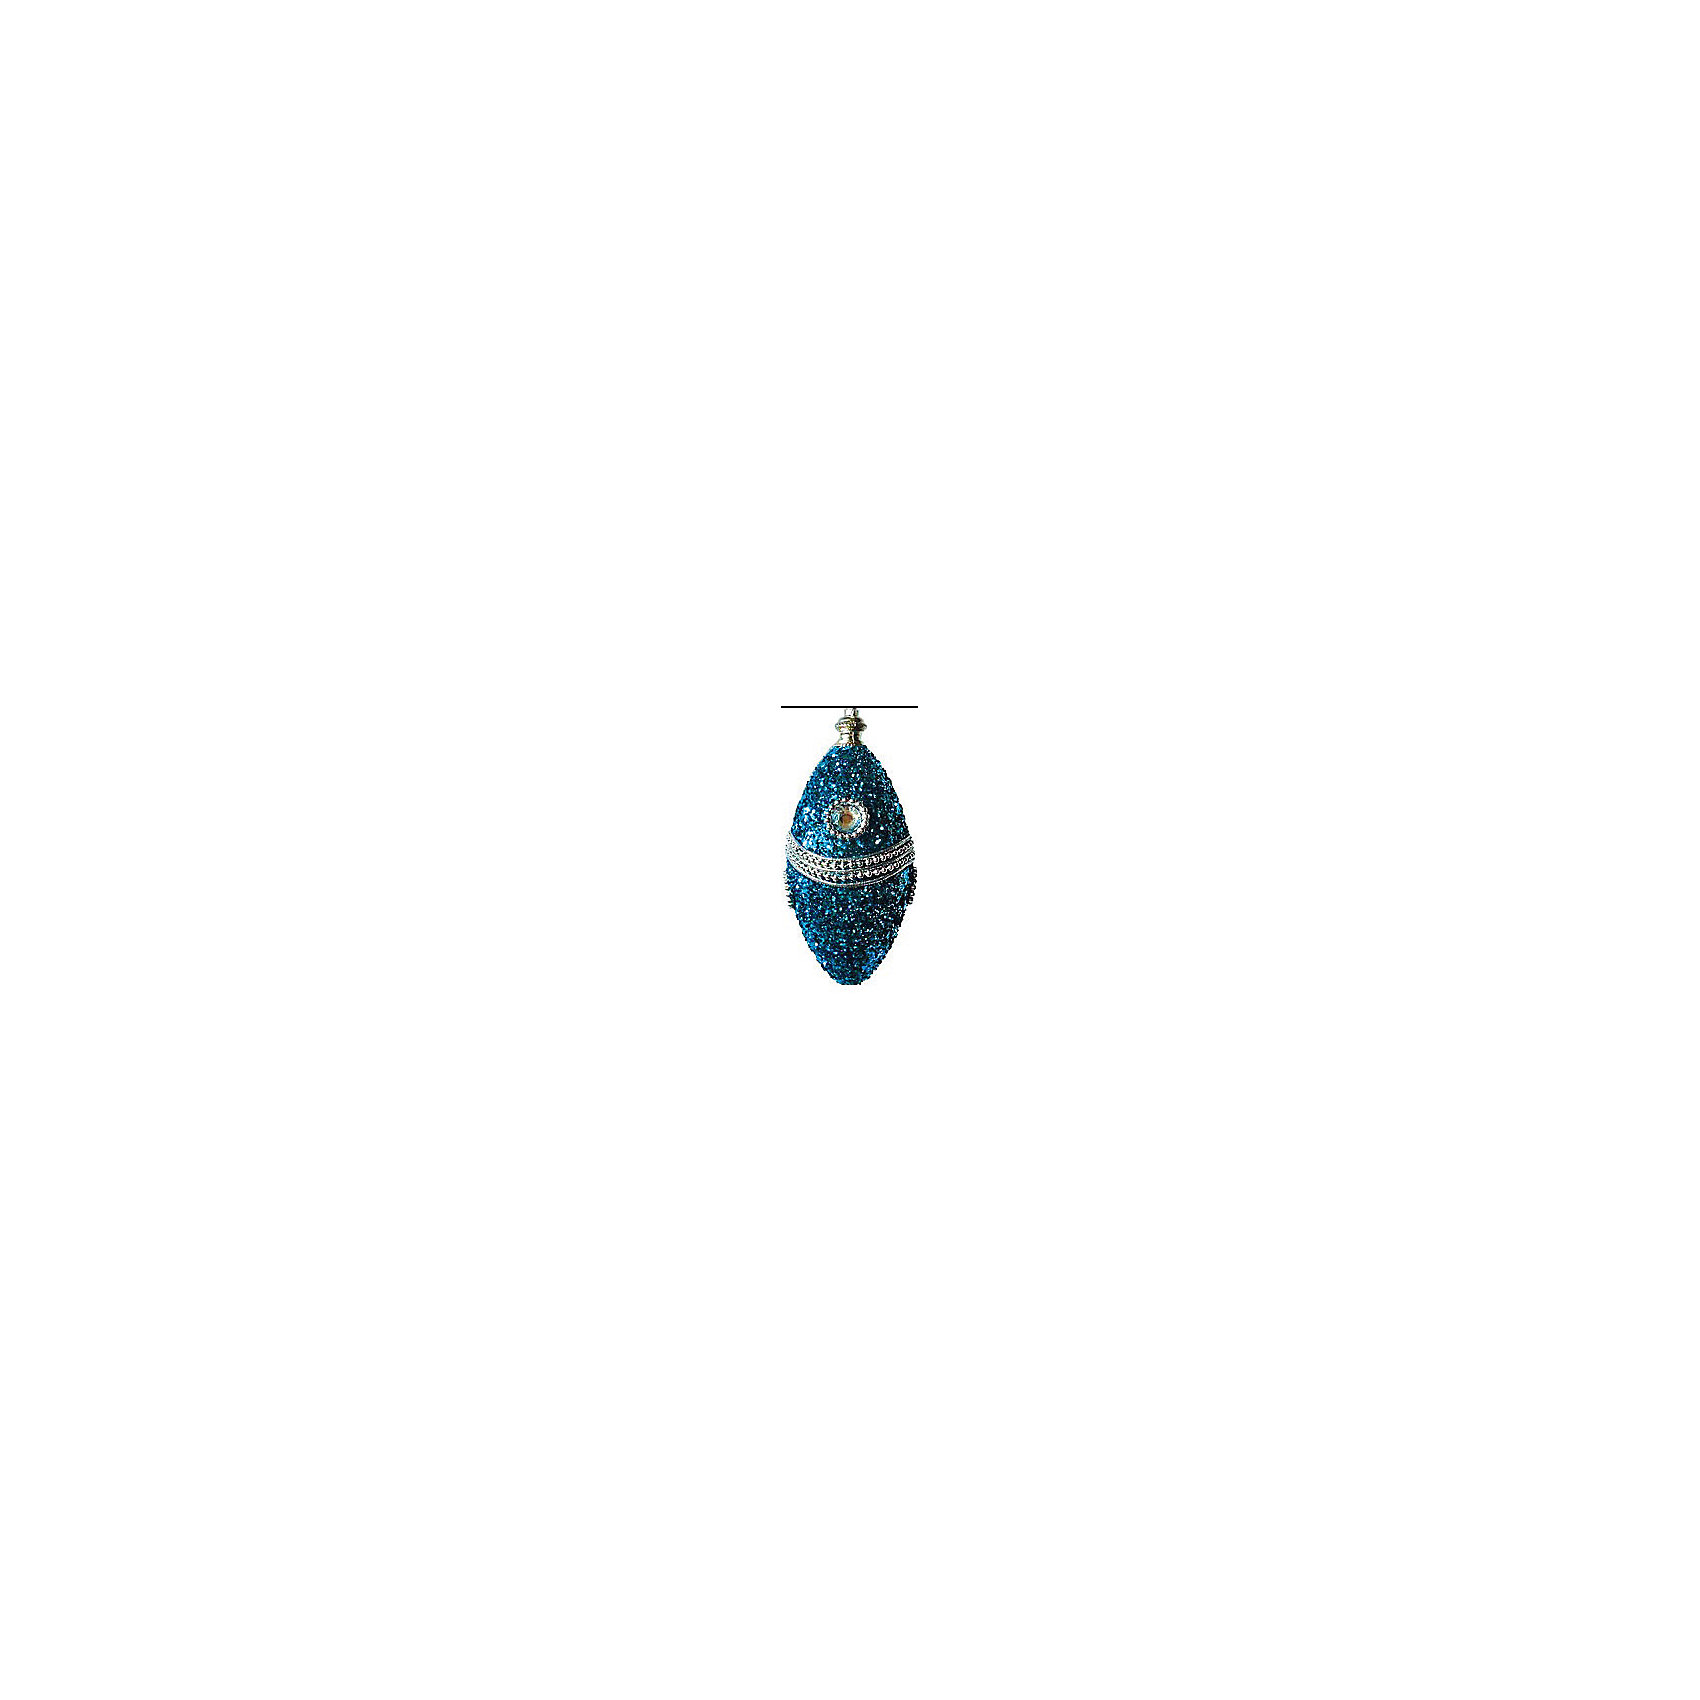 Marko Ferenzo Набор Сосулька 13 см, 3 шт, синий/серебро marko ferenzo набор желудей 3 шт grande 4 см золотой